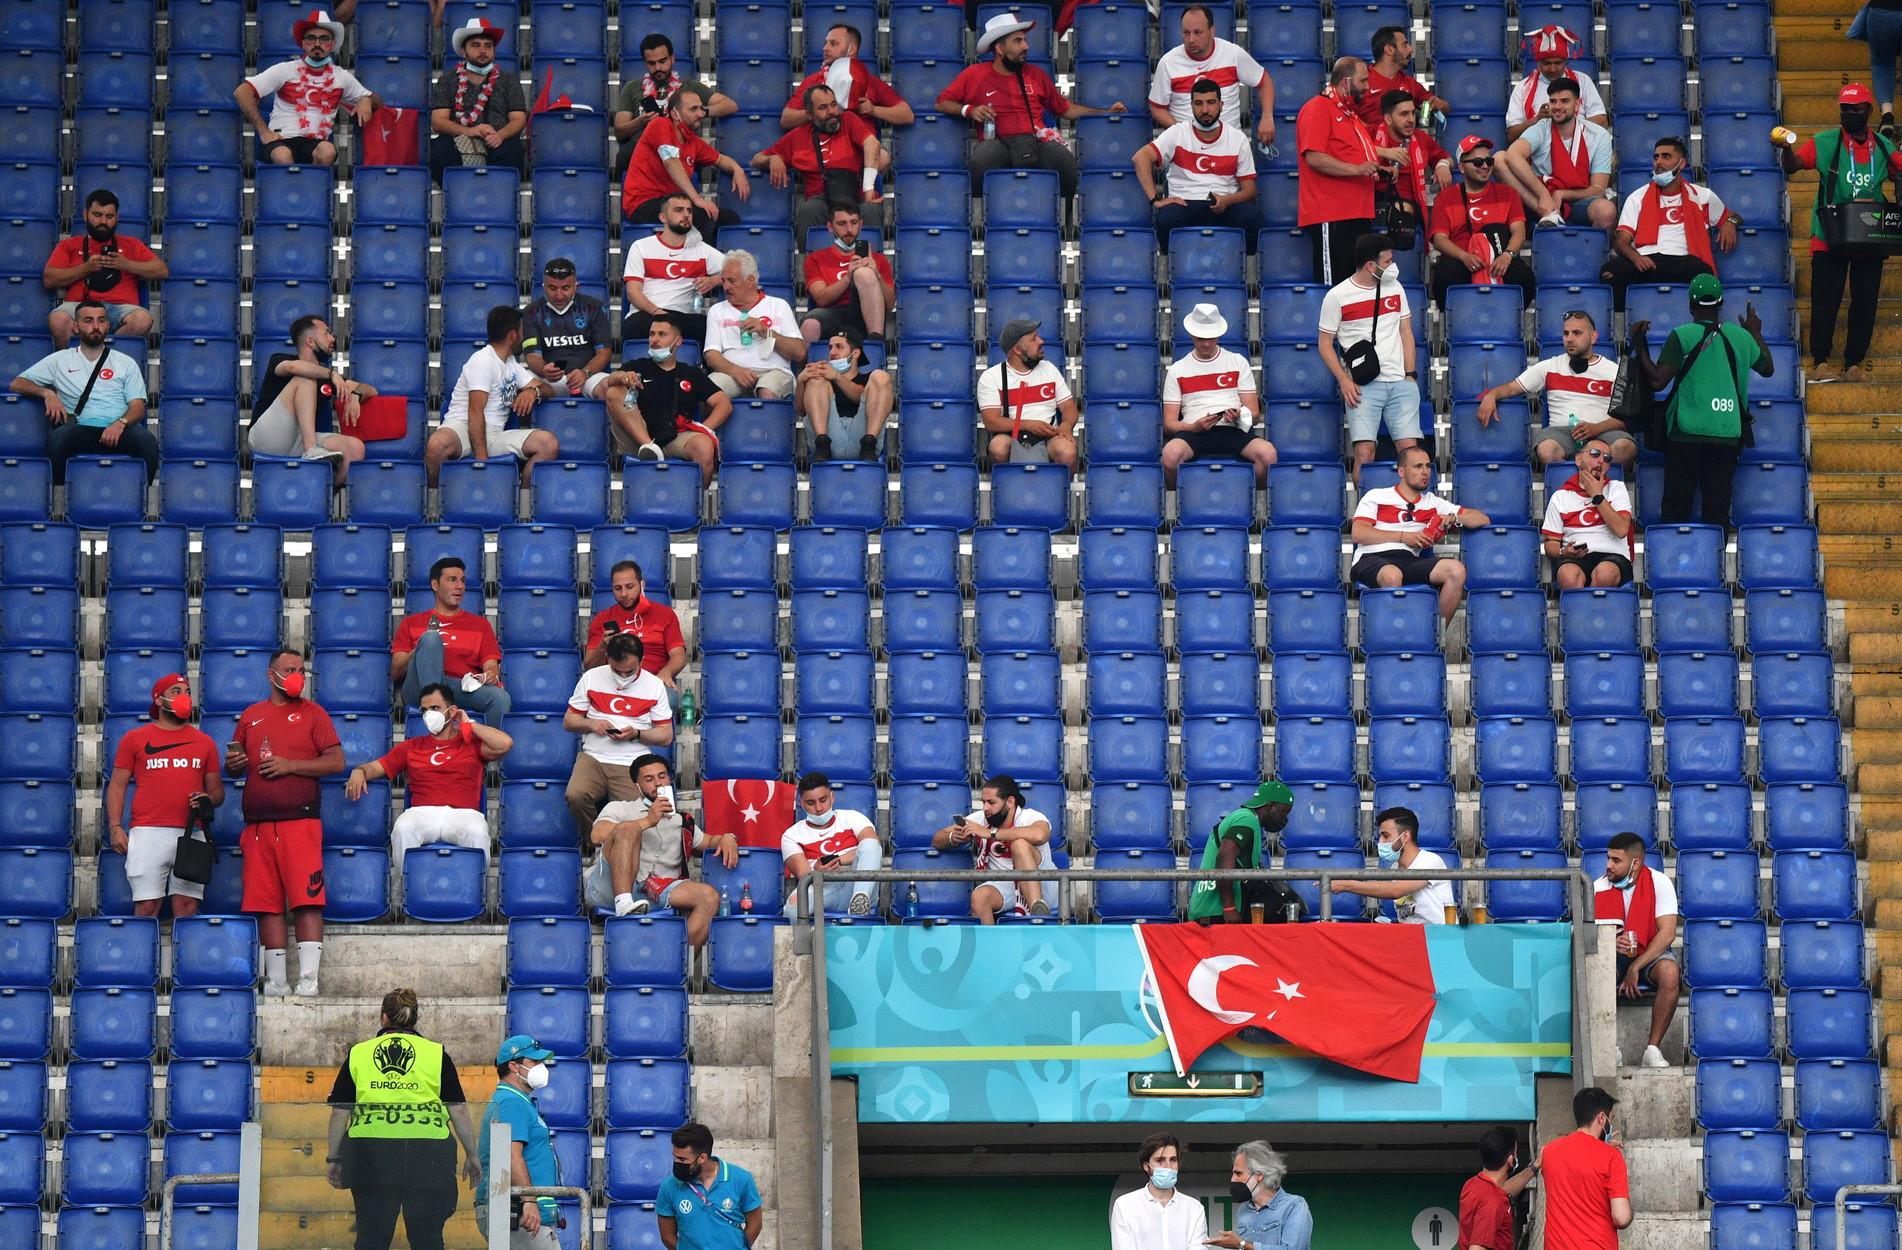 La partita d&#39;esordio degli Europei con 16mila tifosi.<br /><br />